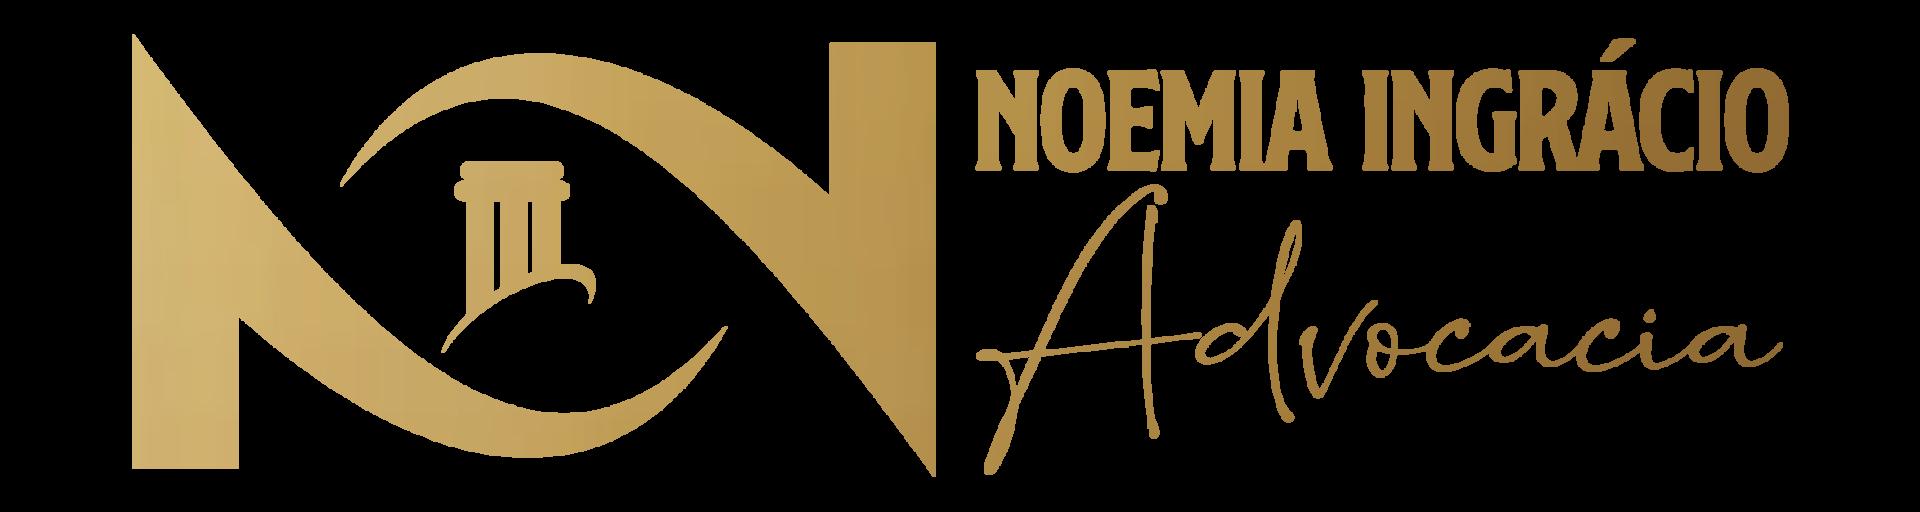 Noemia Ingrácio Advocacia